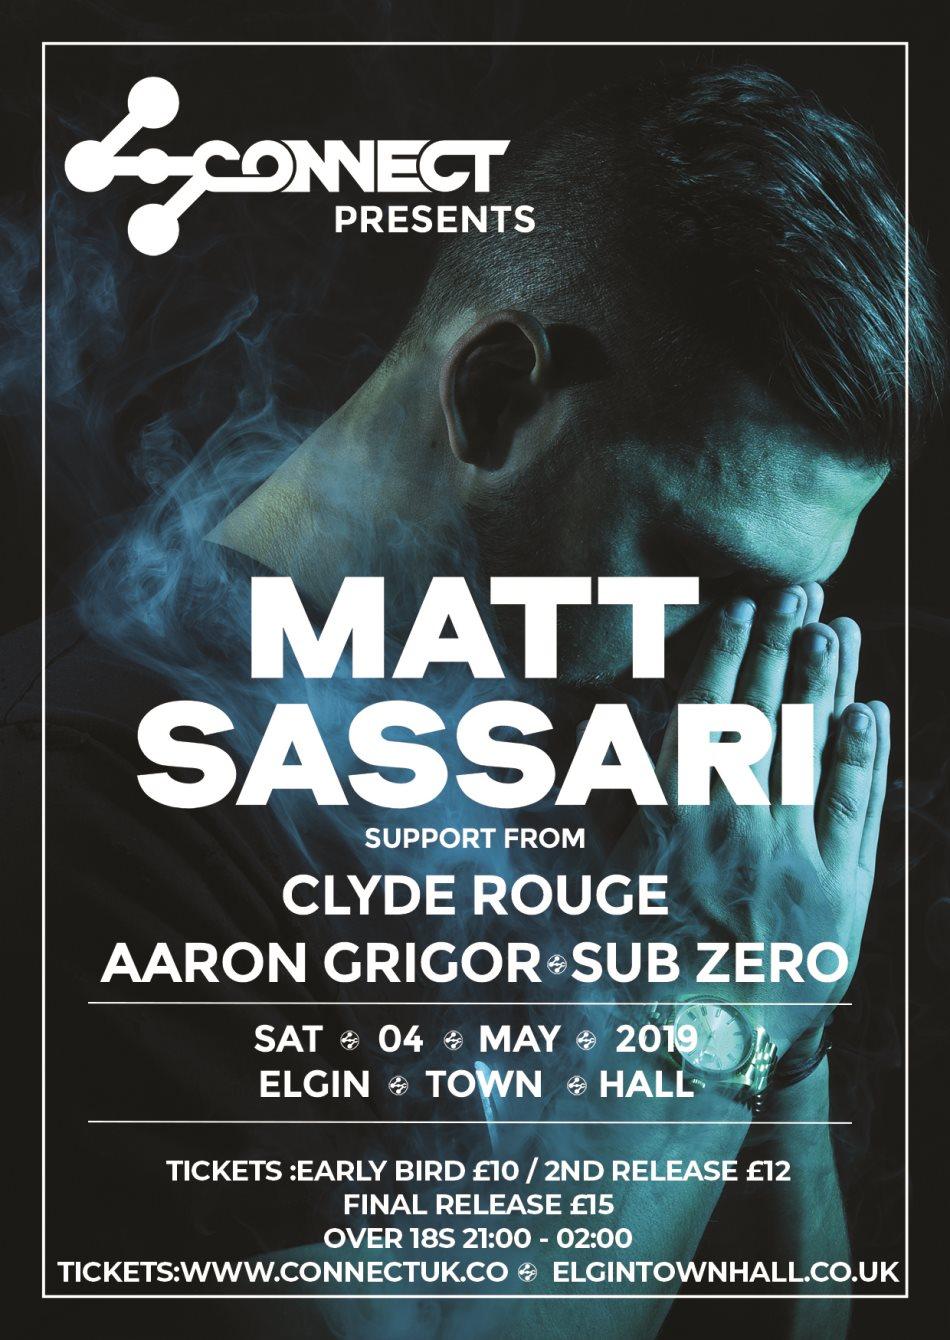 Connect presents Matt Sassari - Flyer front